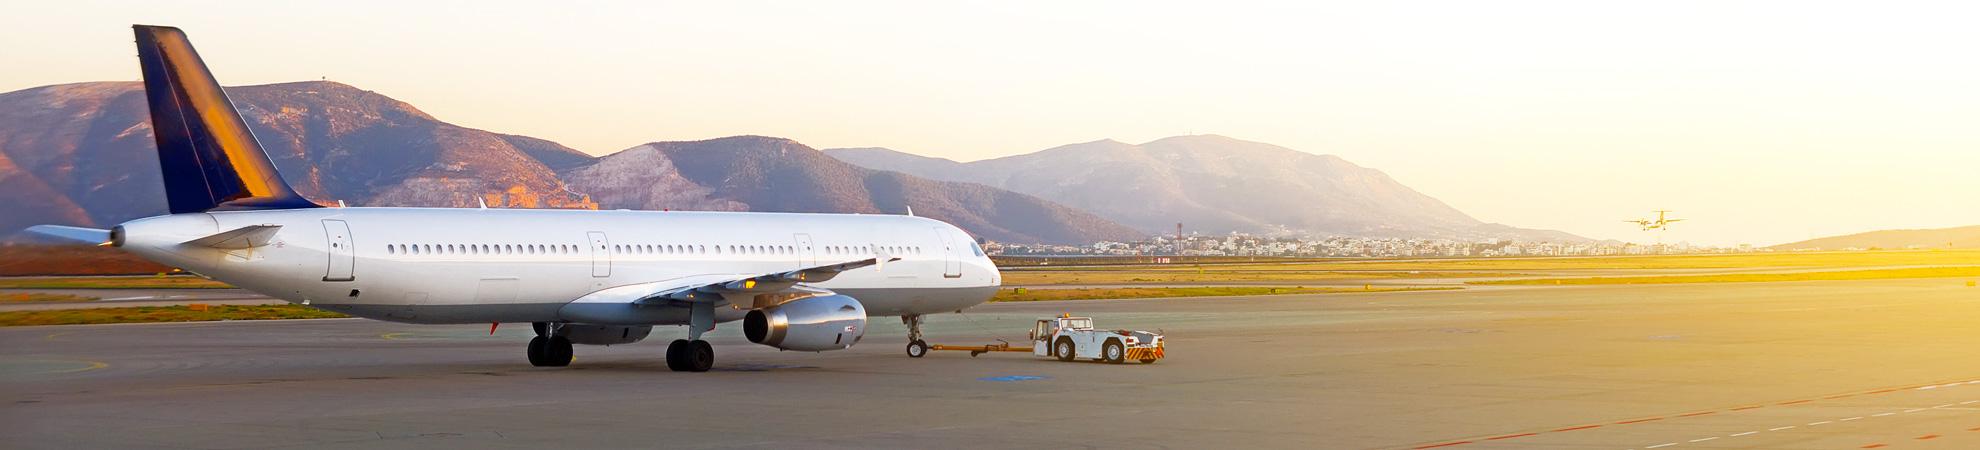 Aller au Sri Lanka par avion